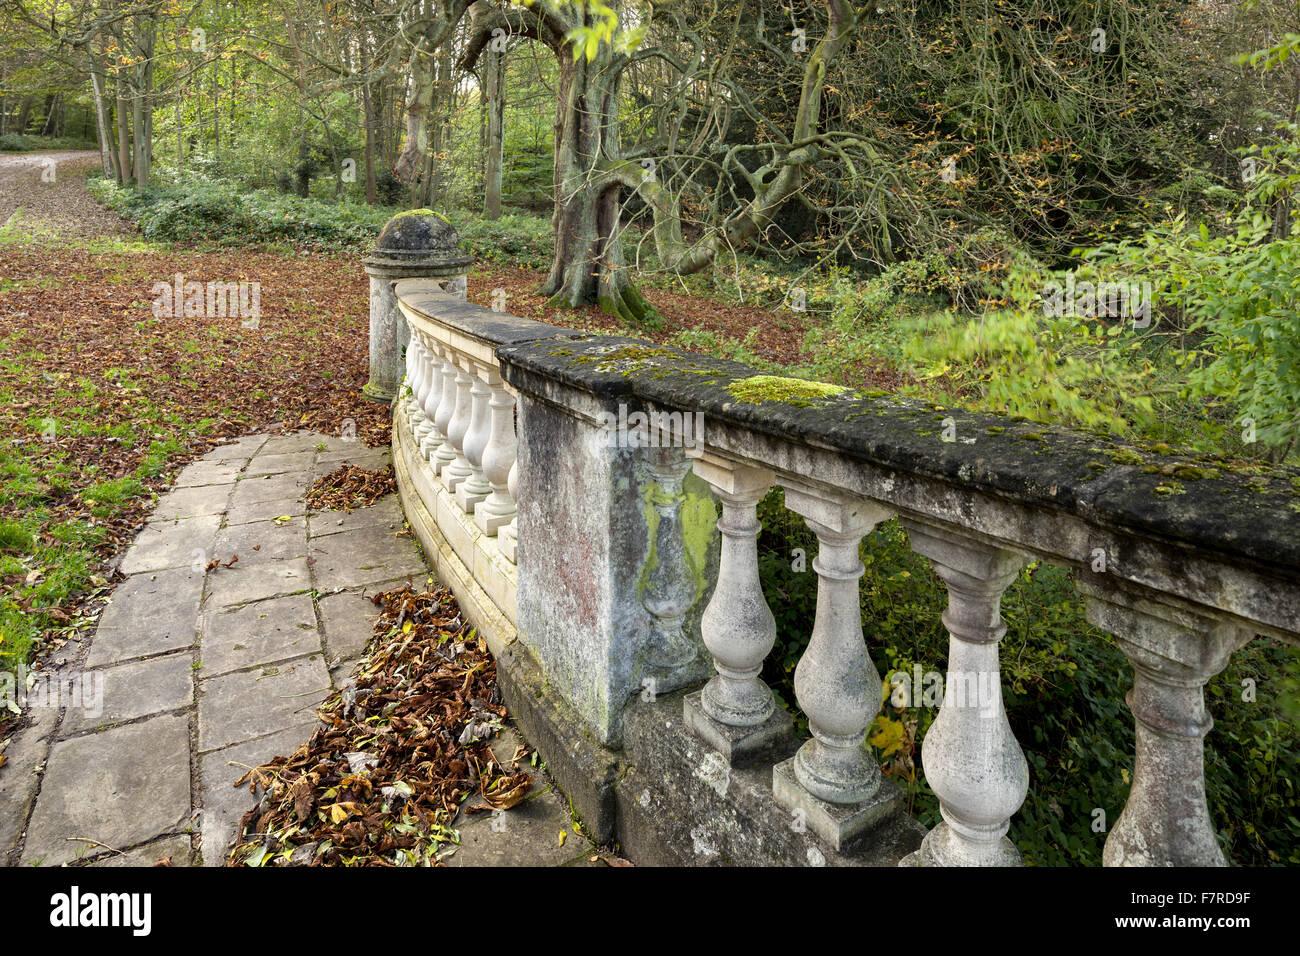 Clumber Bridge che mostra alcuni recenti lavori di riparazione, a Clumber Park, Nottinghamshire. Foto Stock